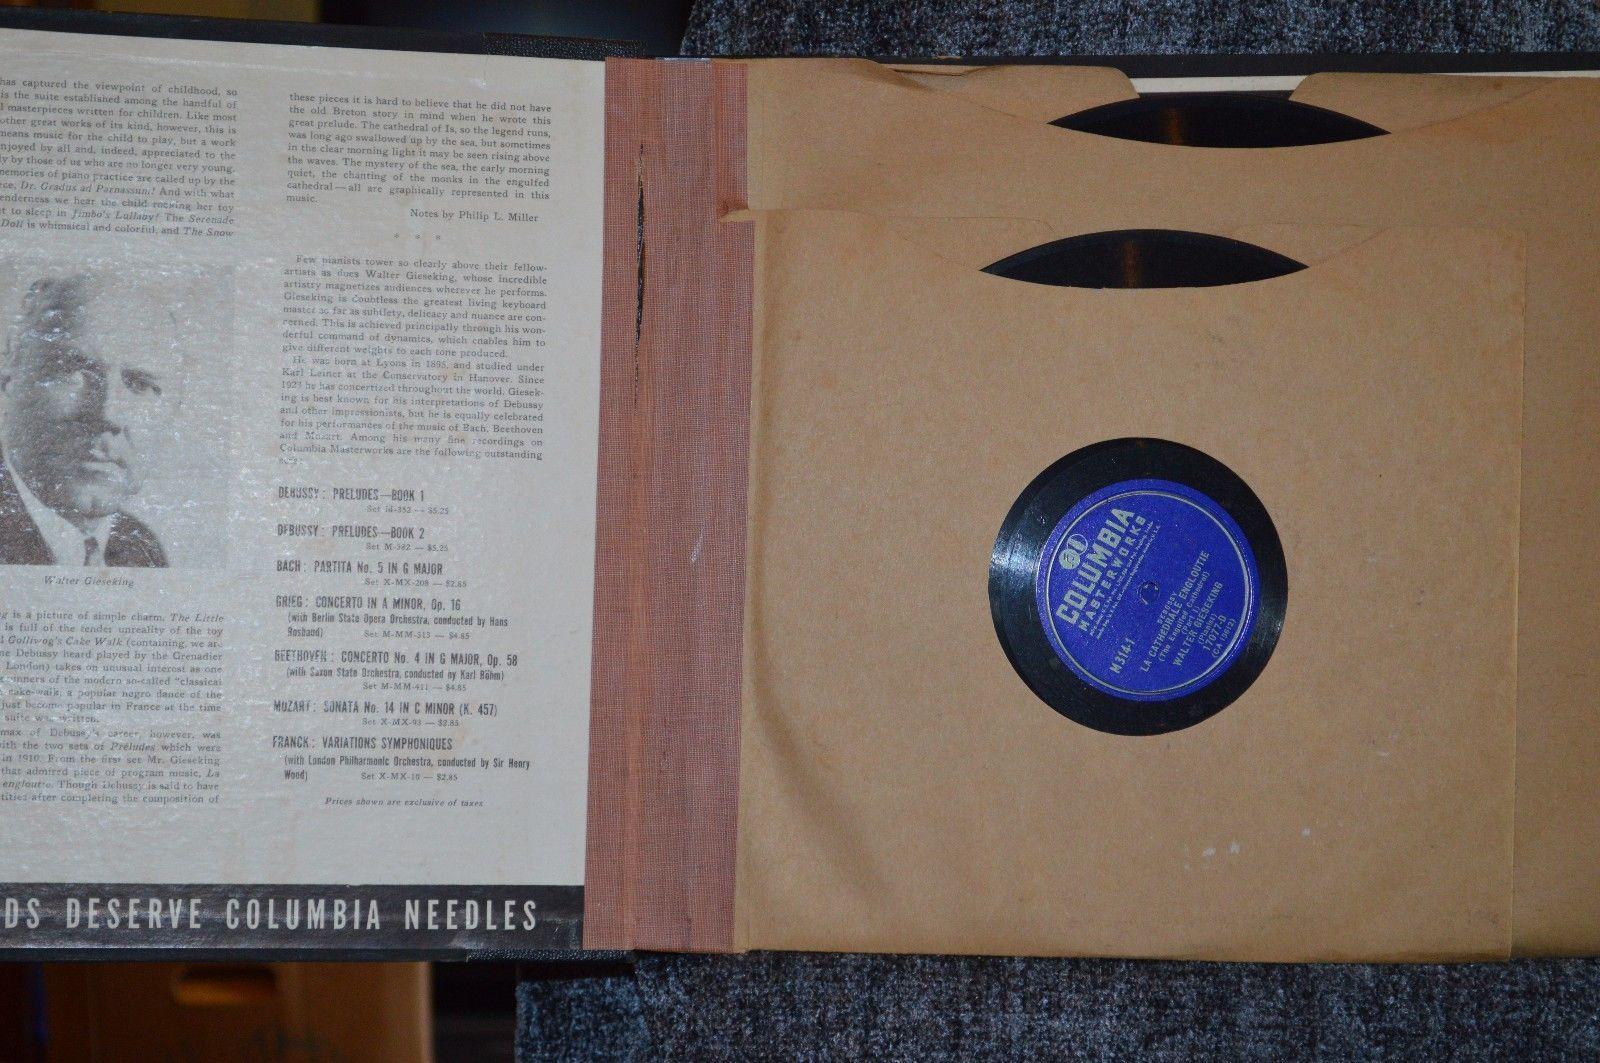 Columbia Debussy Masterworks Set M-314 - 1941 Original recording, vinyl